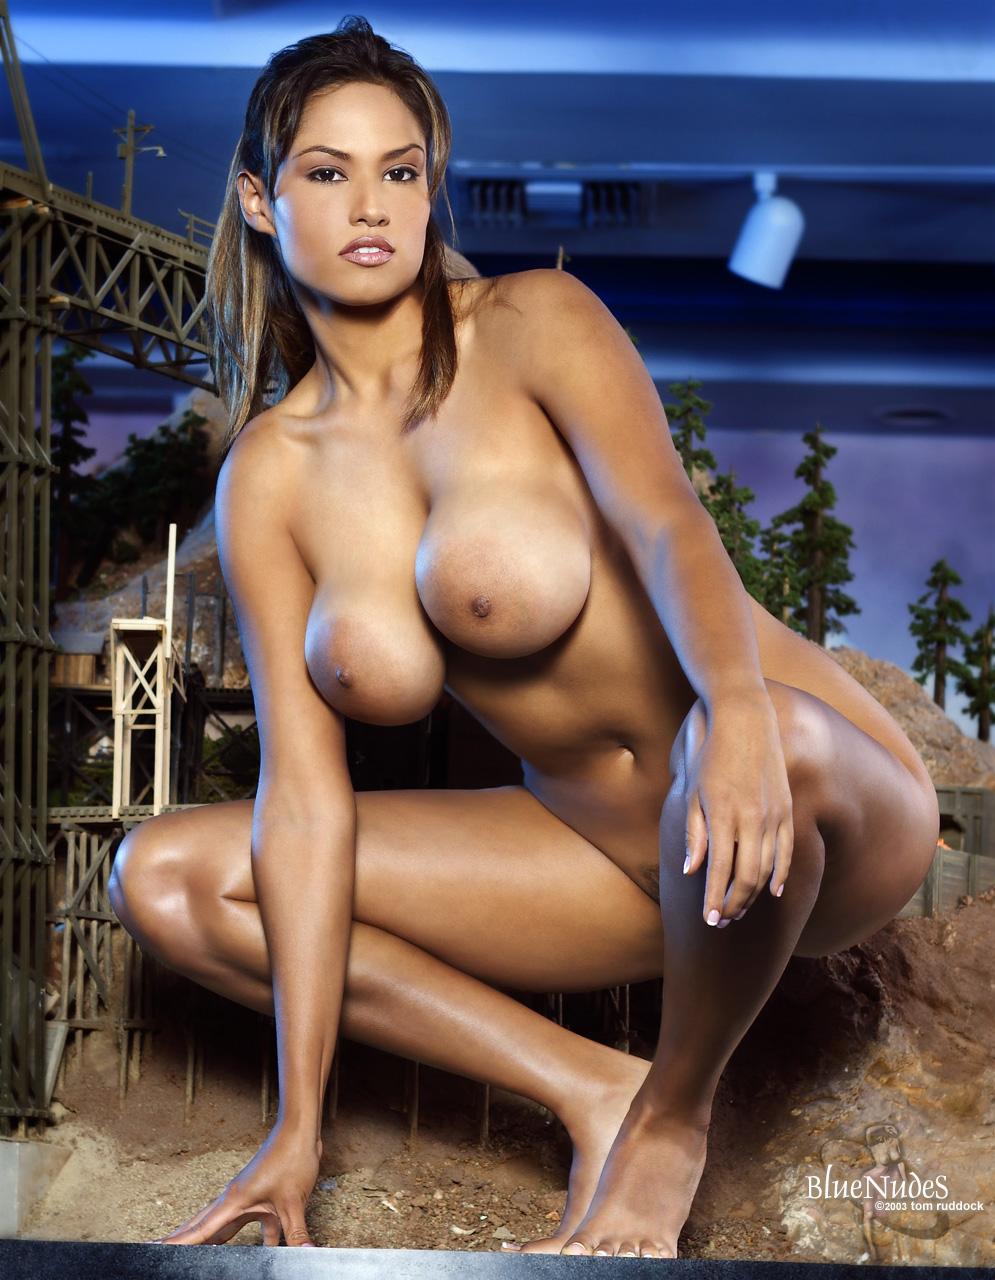 Life size nude pics